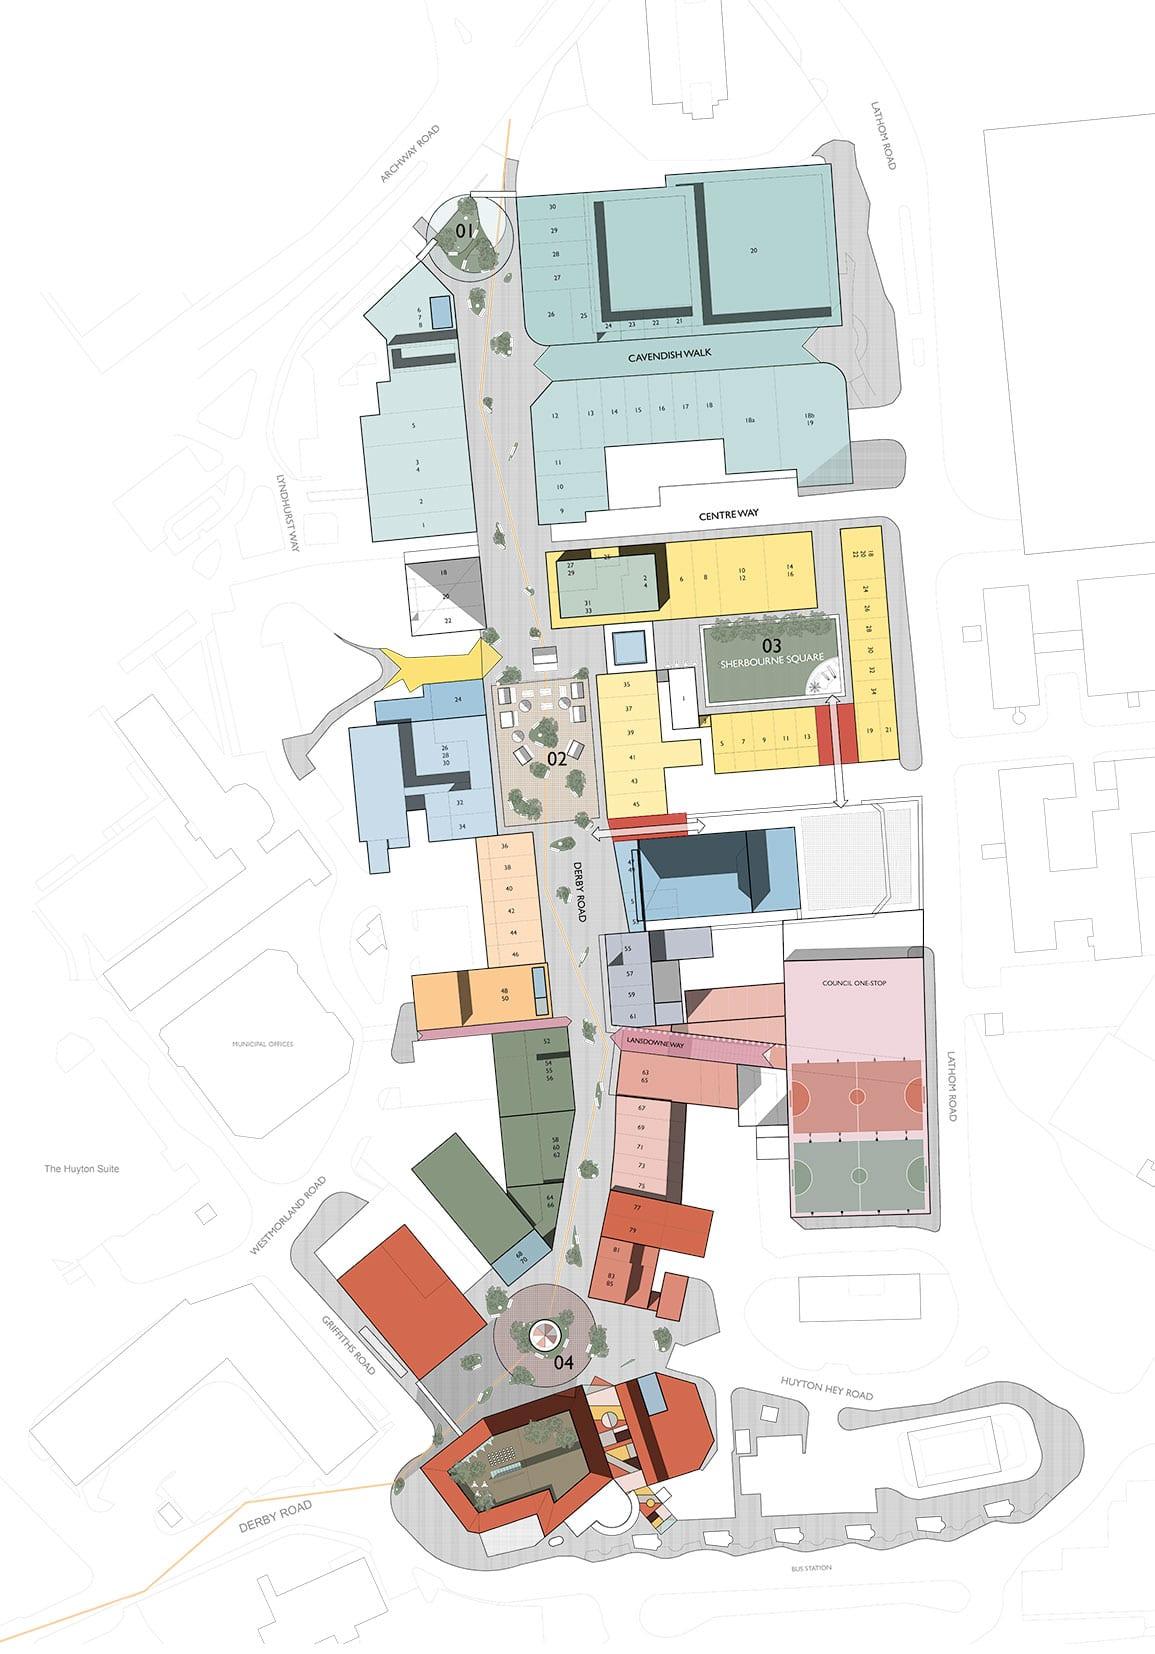 Huyton Shops Shopfronts Urban Regeneration Architectural Emporium